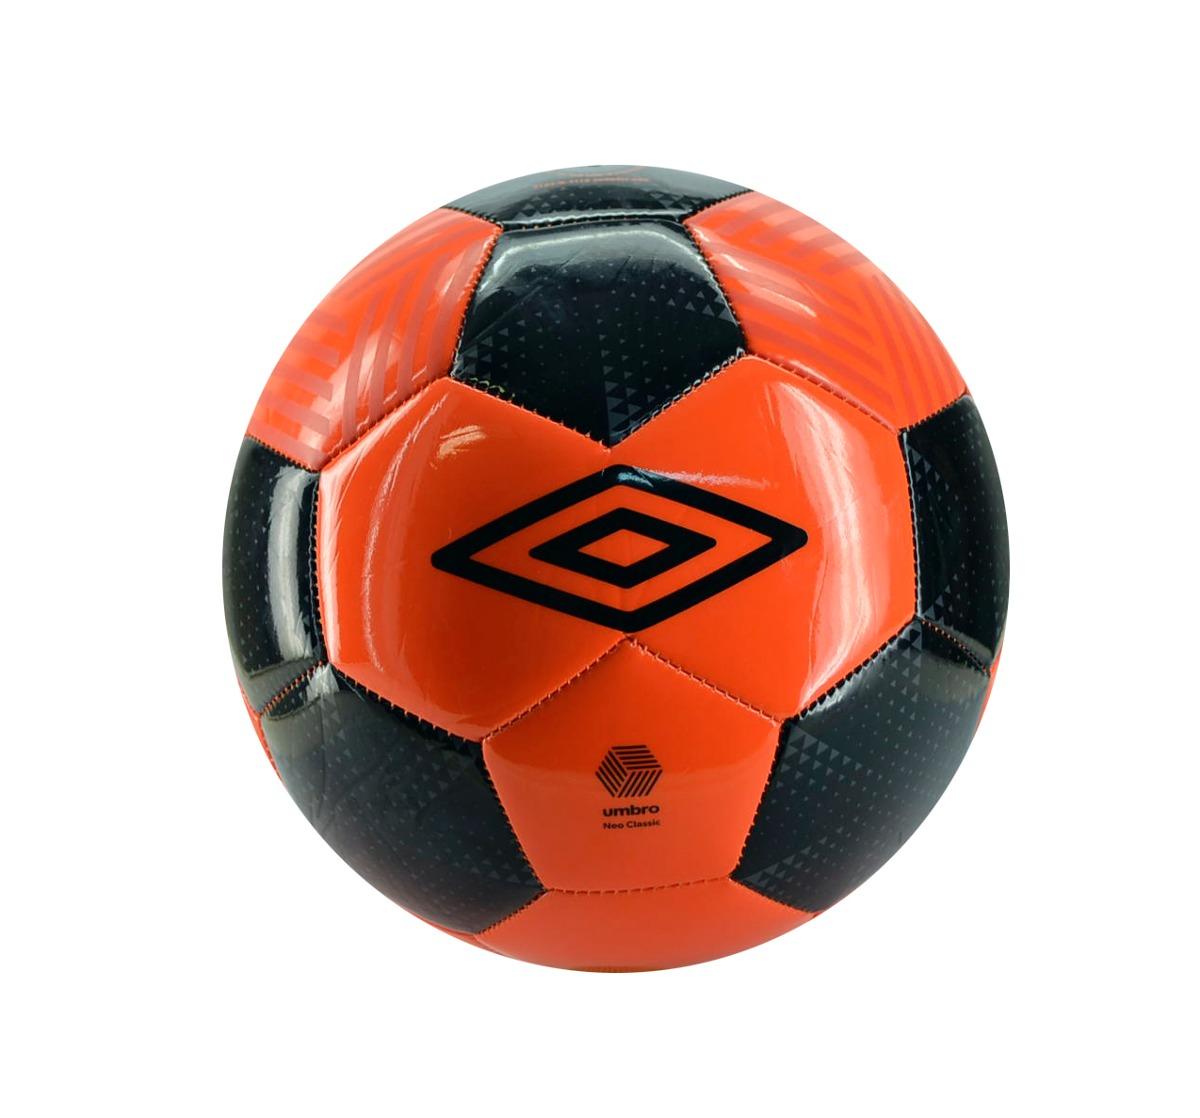 Pelota futbol umbro neo classic original naranja cargando zoom jpg  1200x1118 Naranja pelota futbol d9dd4039aeeff